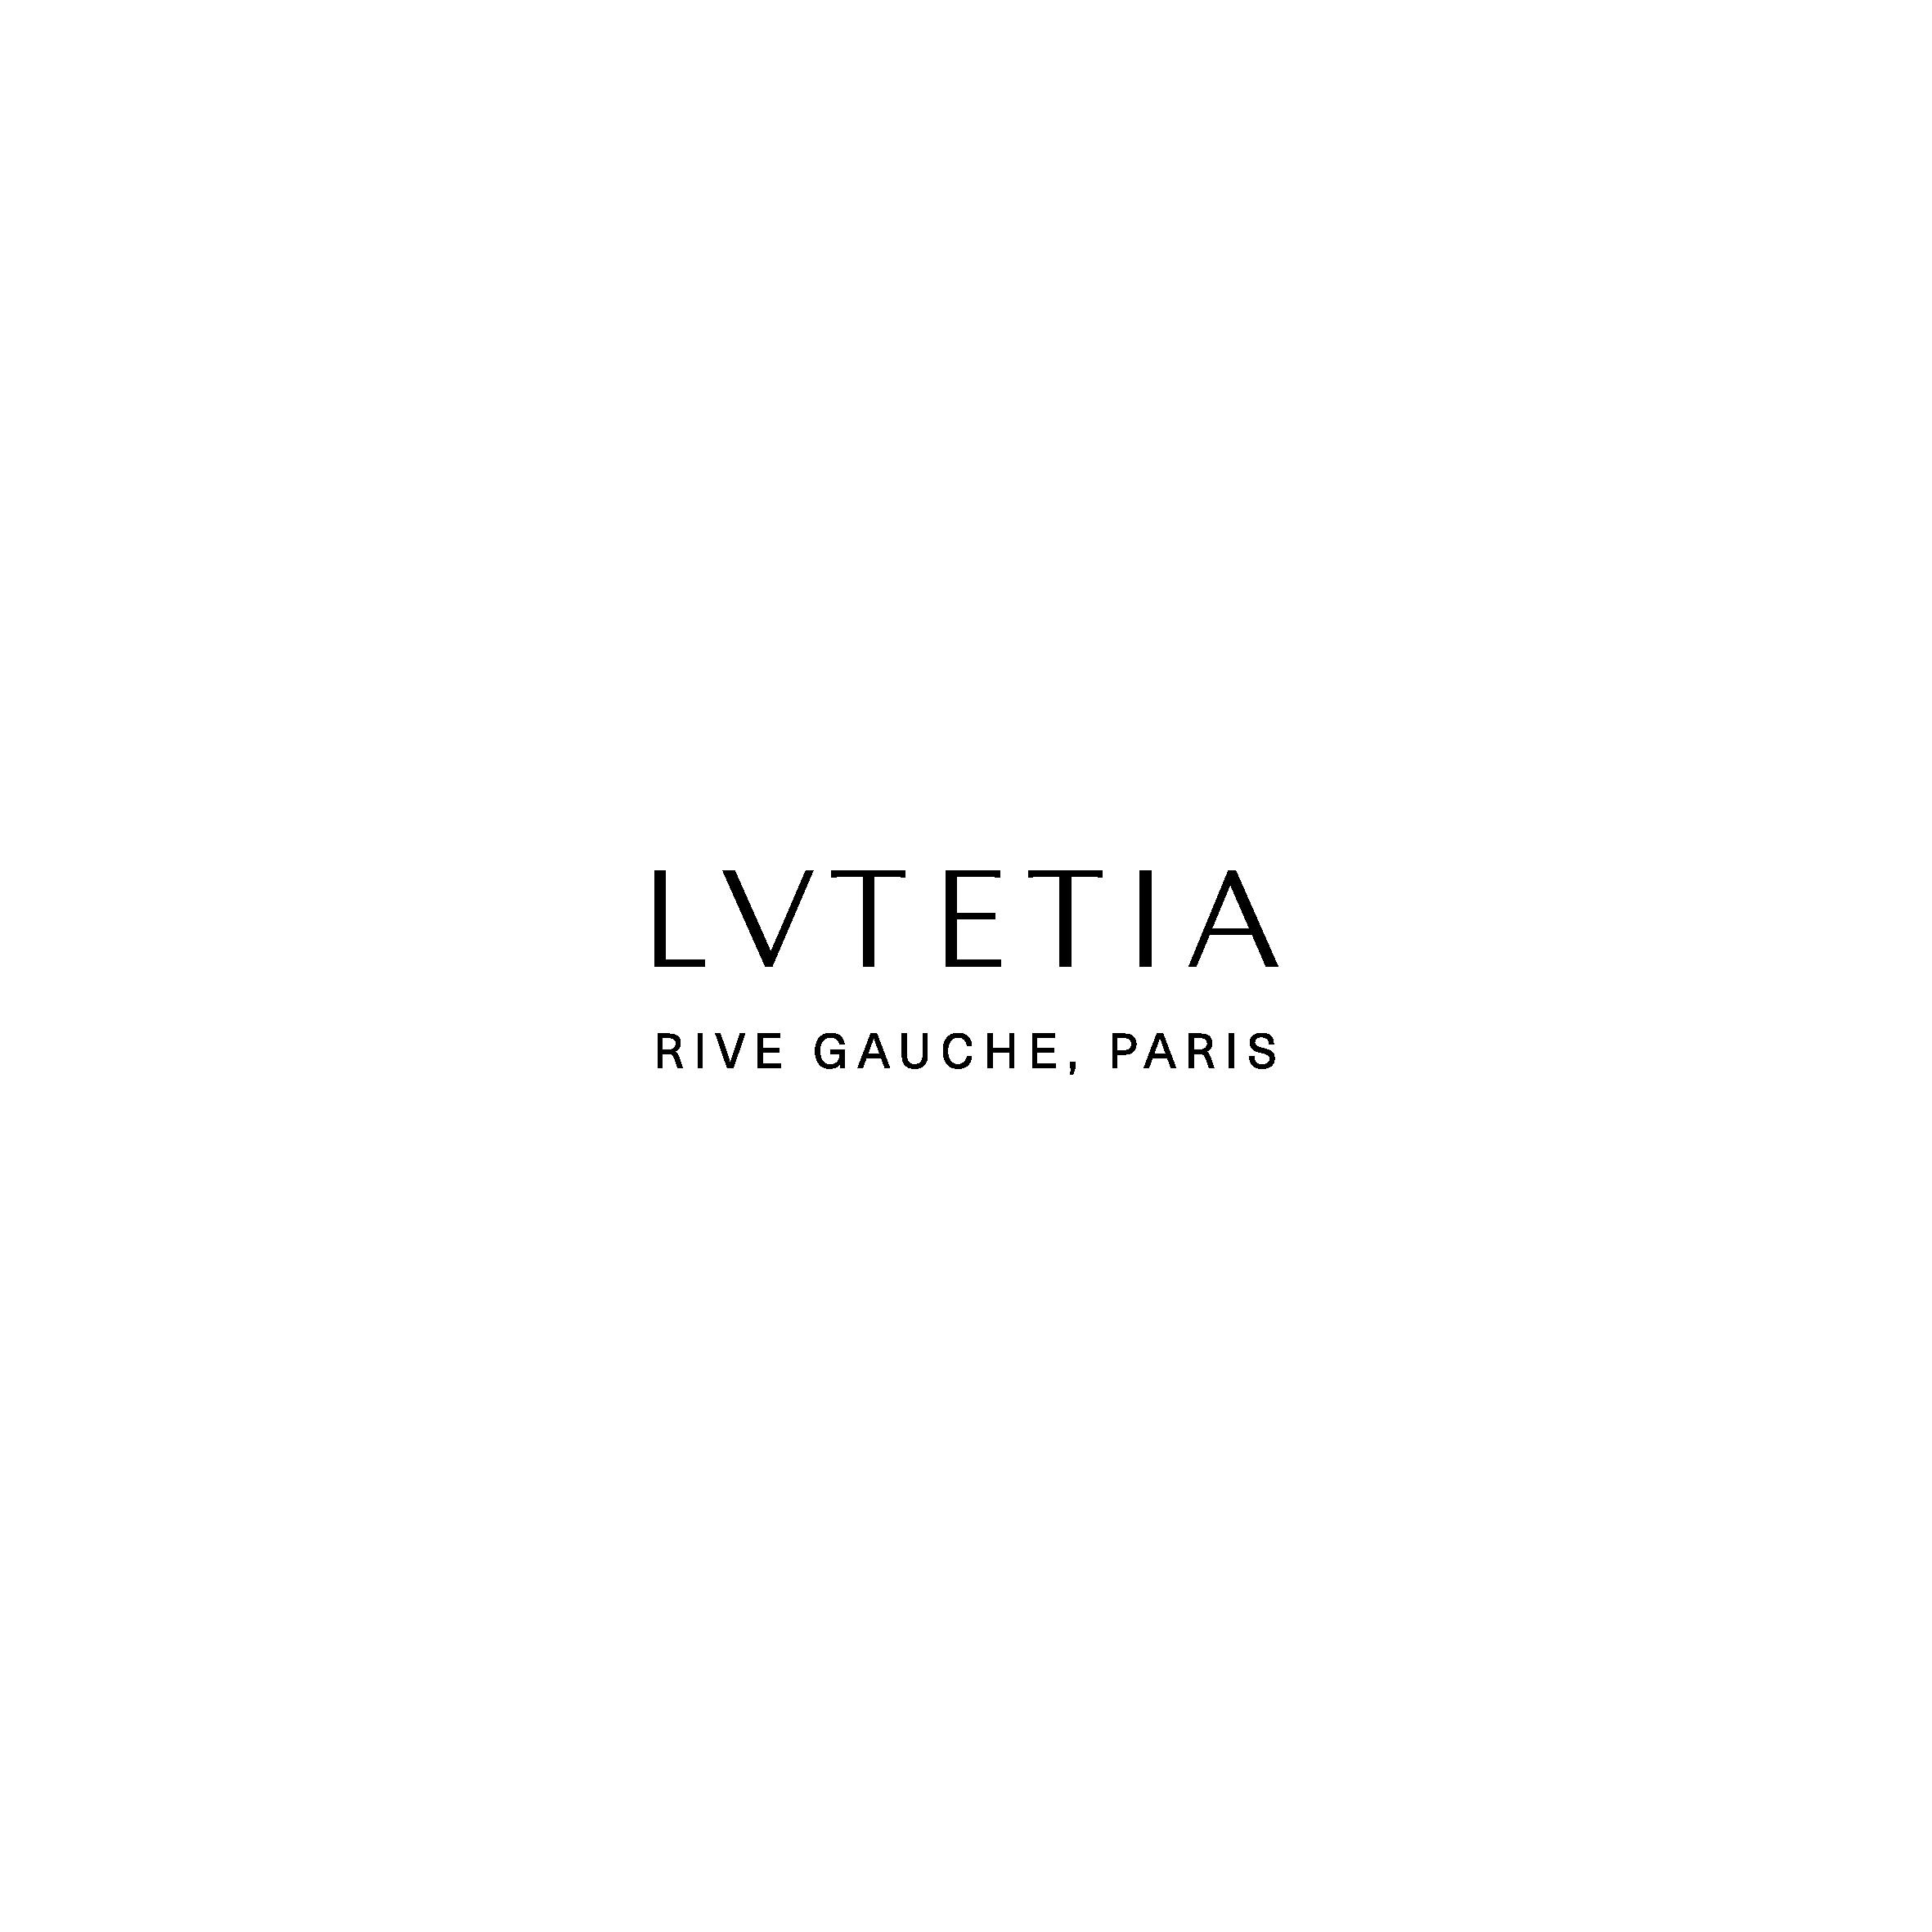 Lutetia_REGULAR_Black_Rivegauche-01